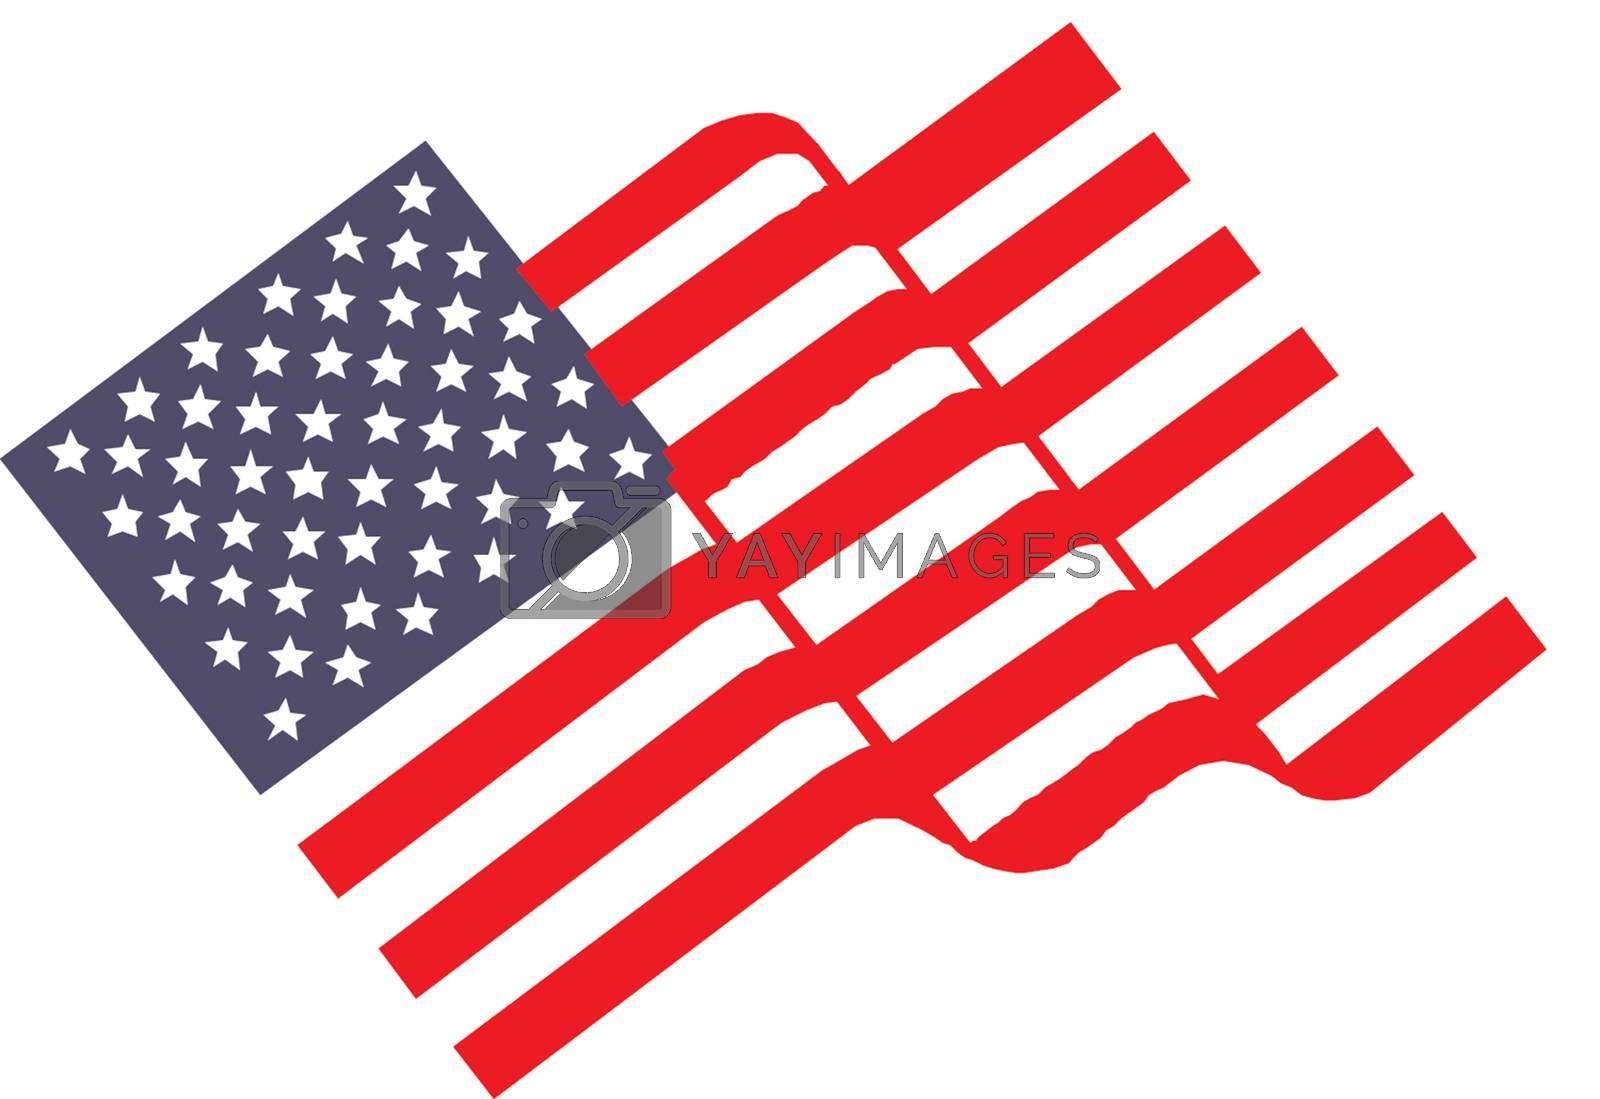 United Stated flag